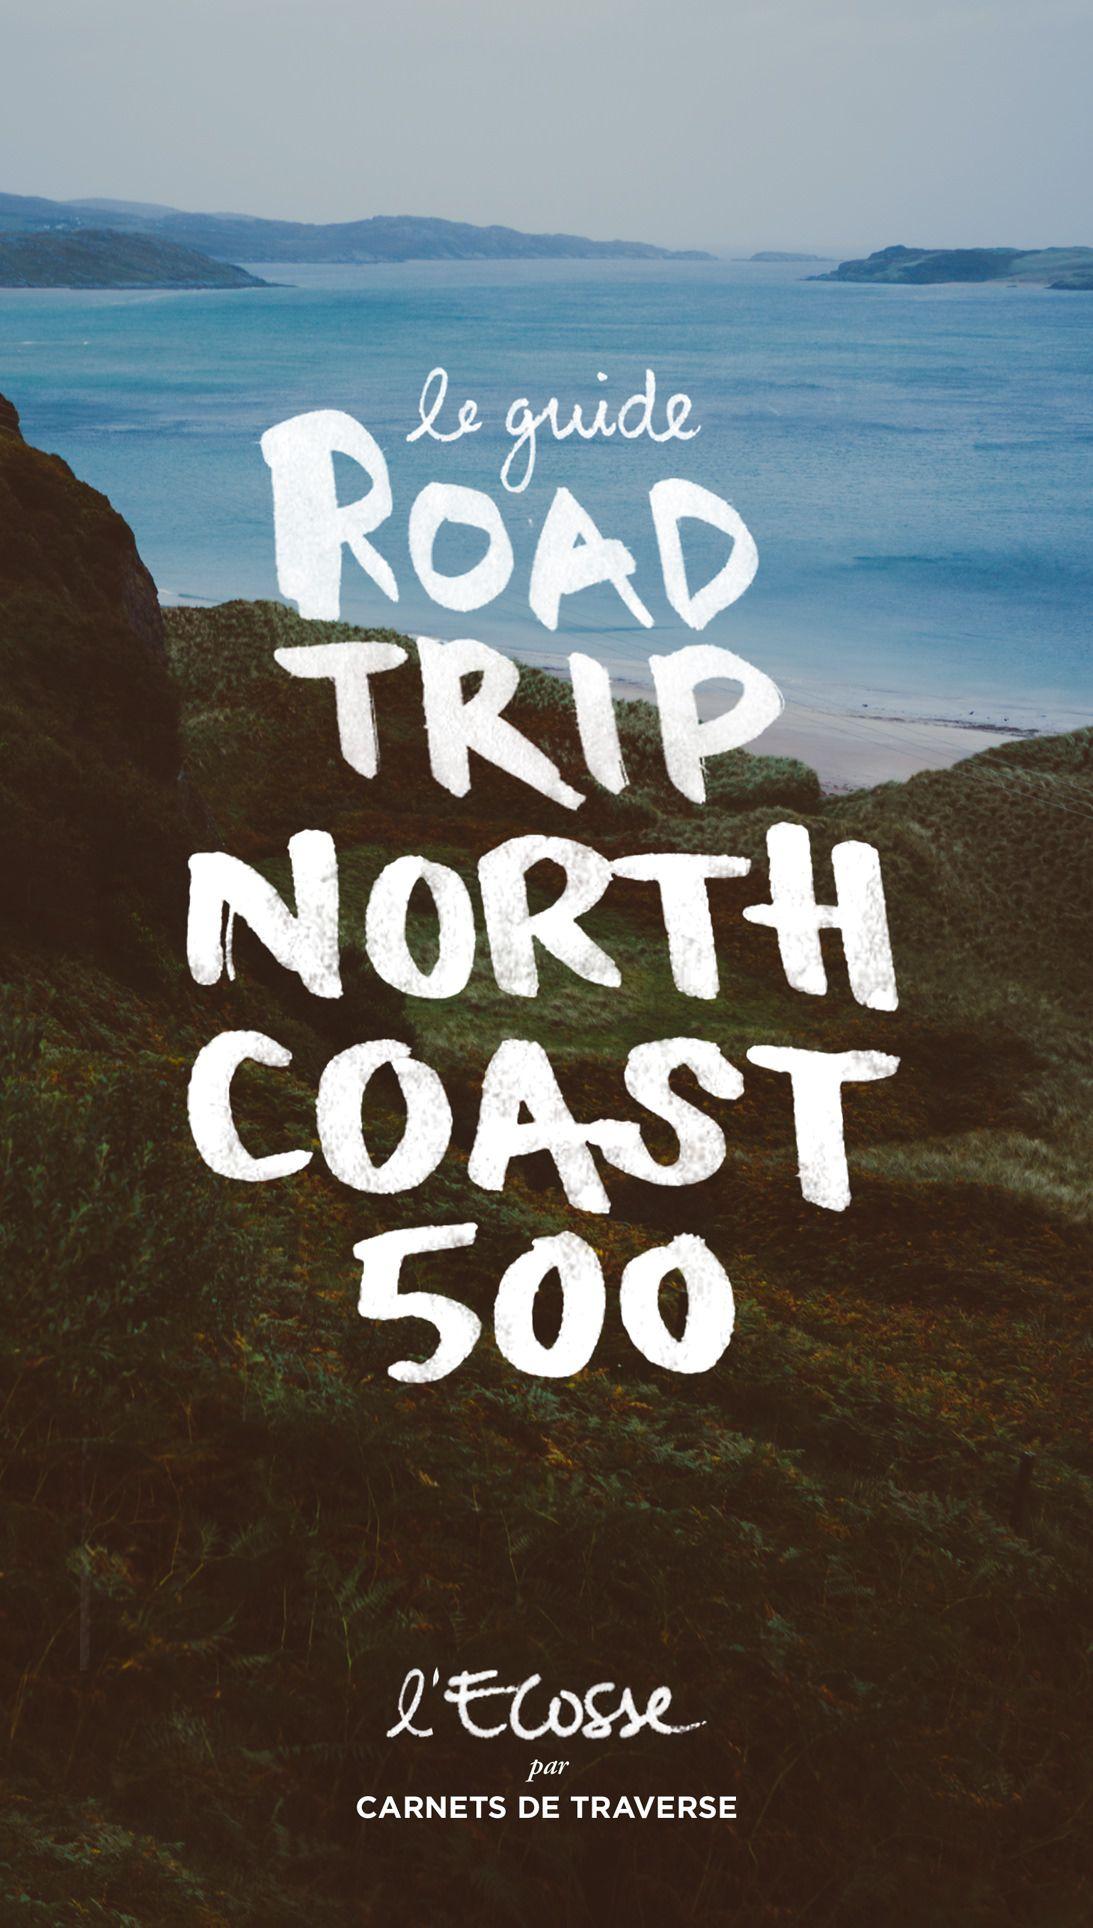 North coast 500 - Road trip Ecosse